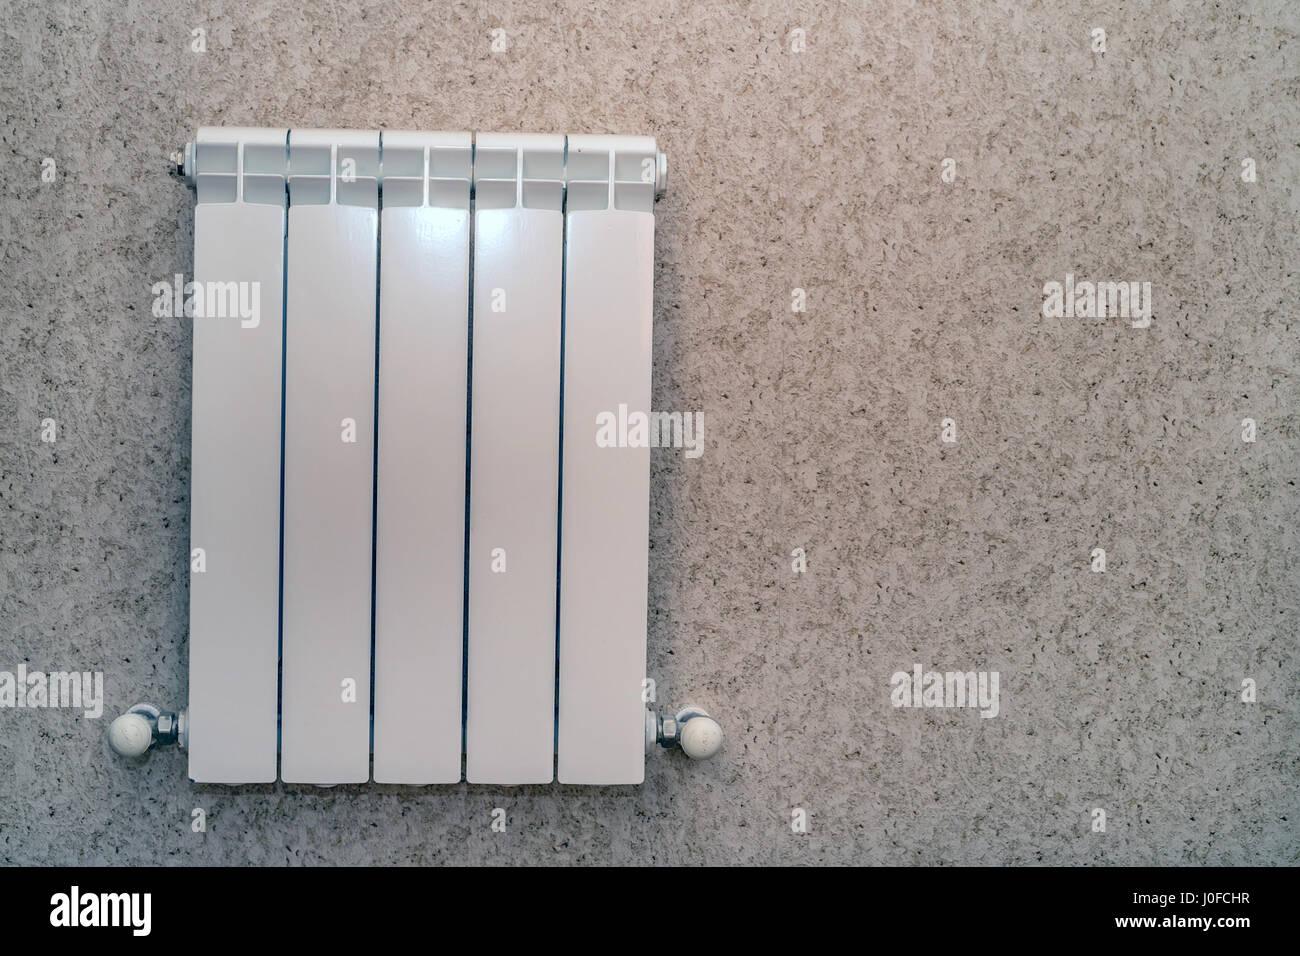 Close-up of modern hot water baseboard radiator - Stock Image